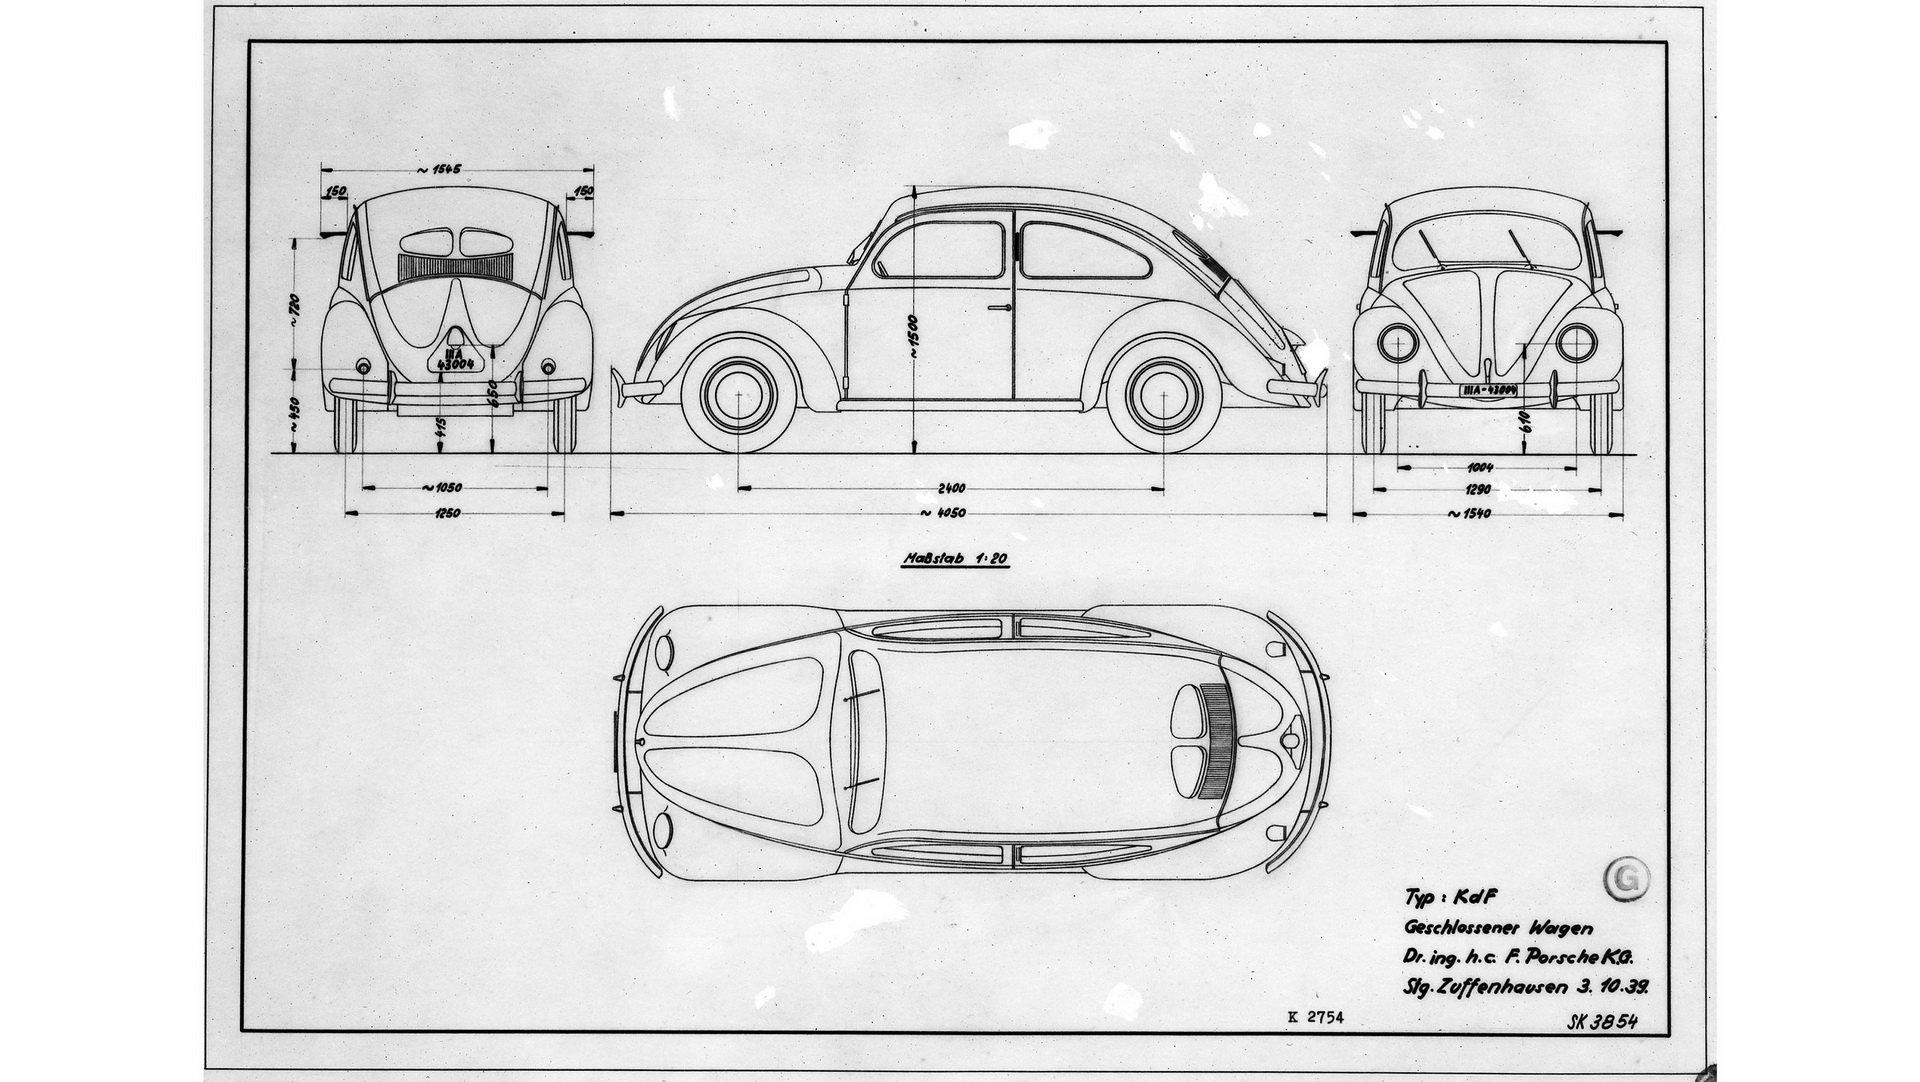 VW-39-10